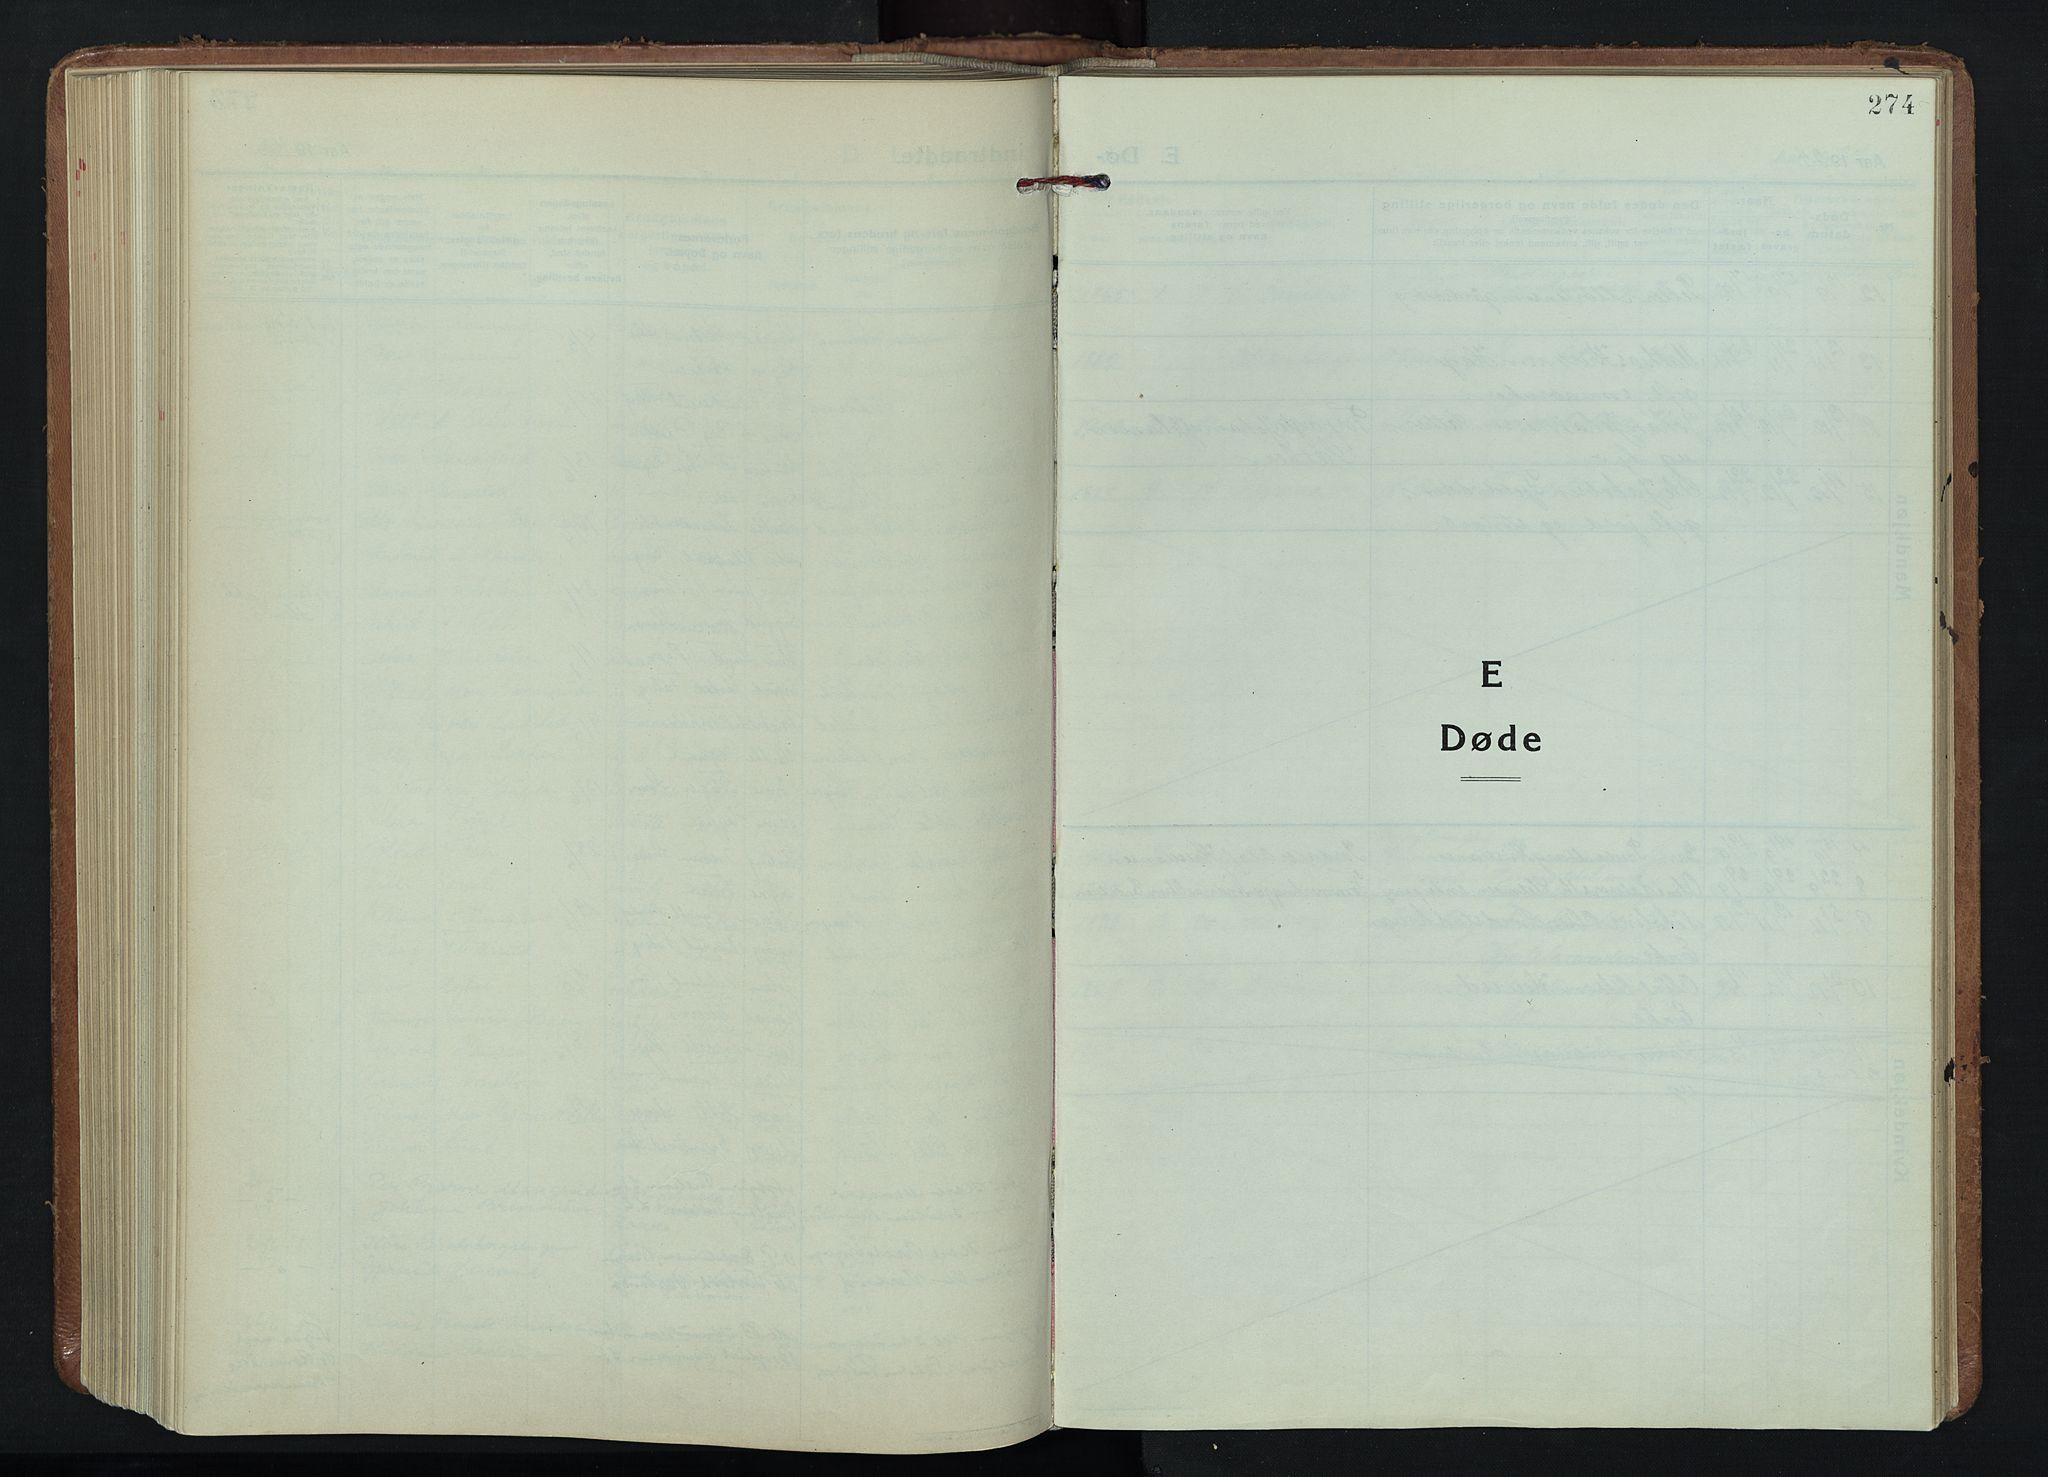 SAH, Fåberg prestekontor, H/Ha/Hab/L0015: Parish register (copy) no. 15, 1924-1949, p. 274